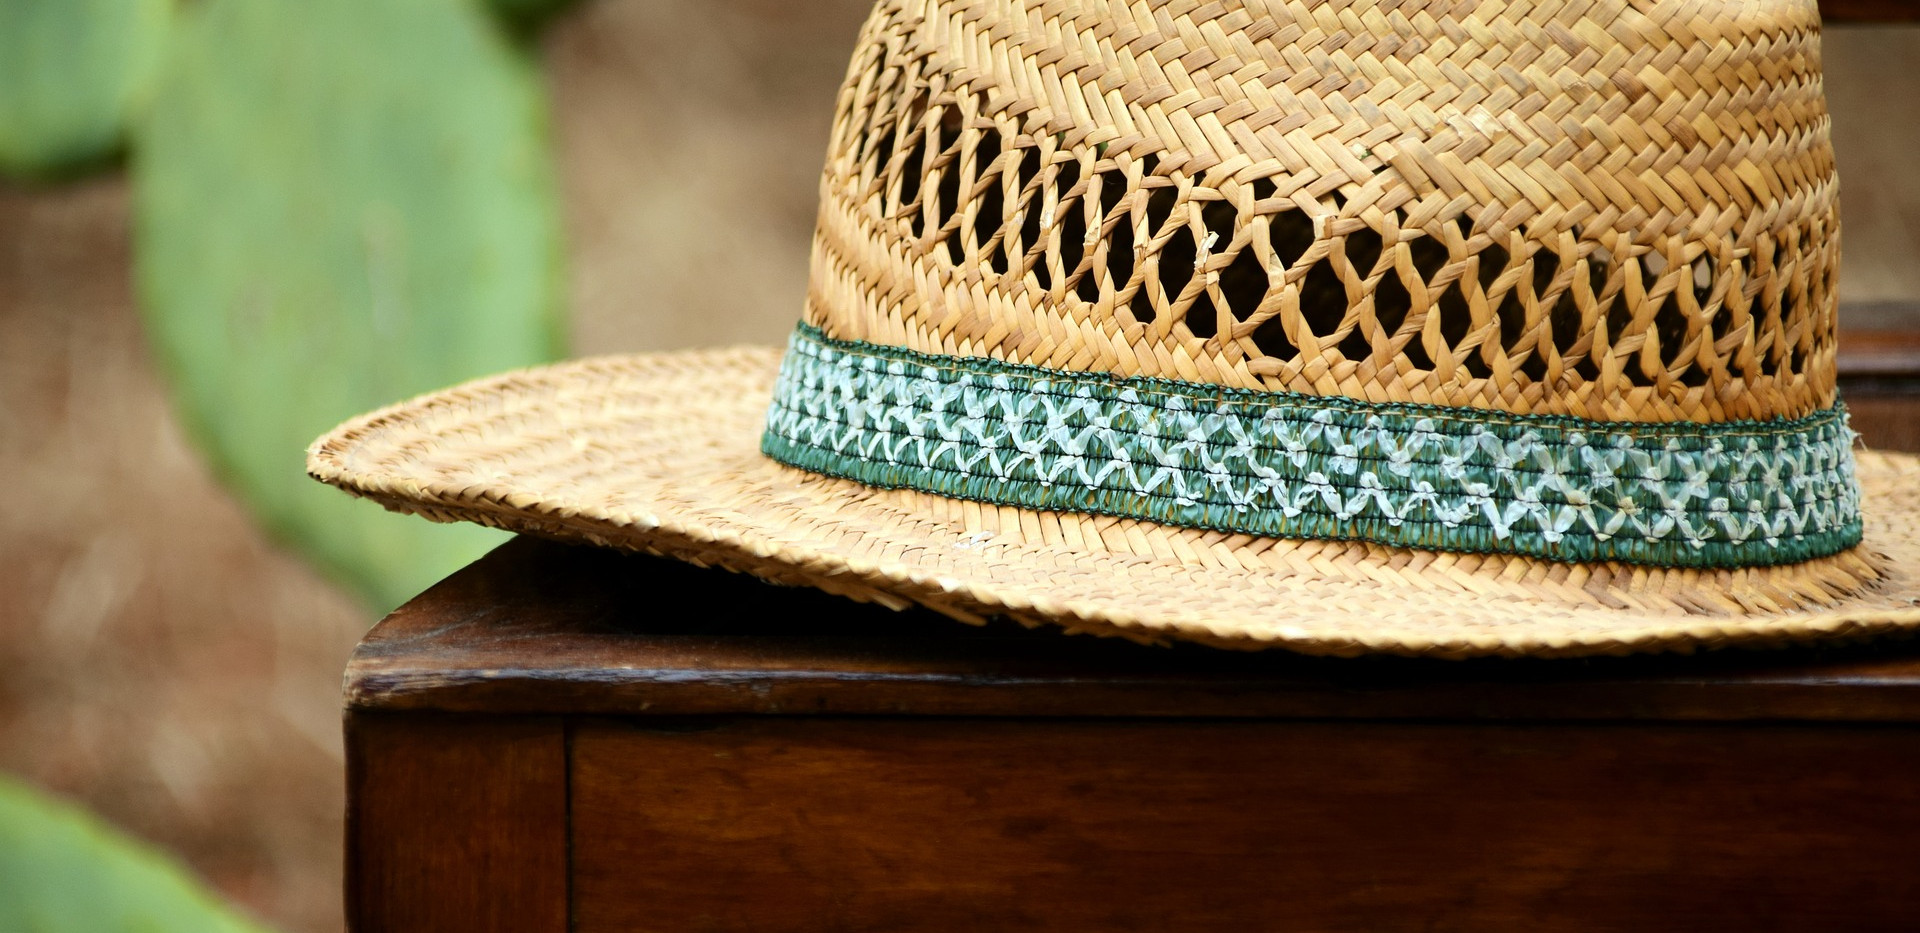 hat-2258676_1920.jpg